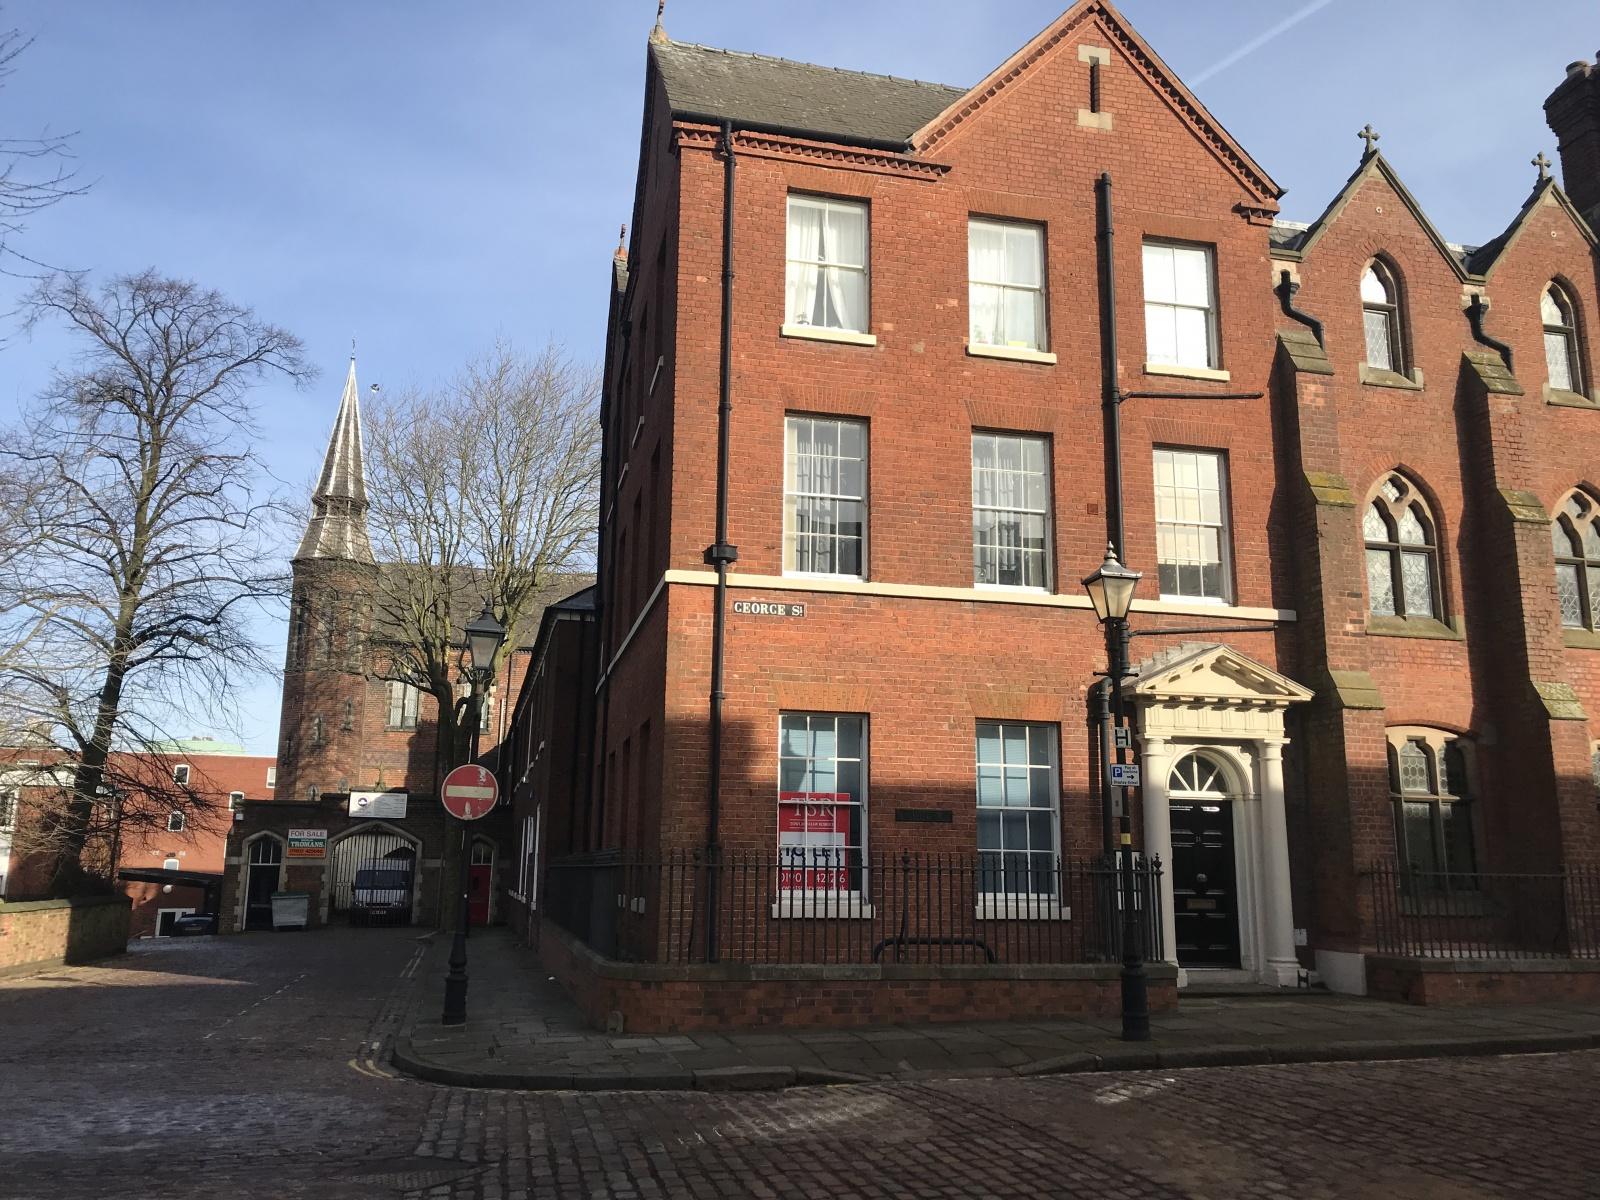 Hanover House, George Street, St Johns Square, Wolverhampton